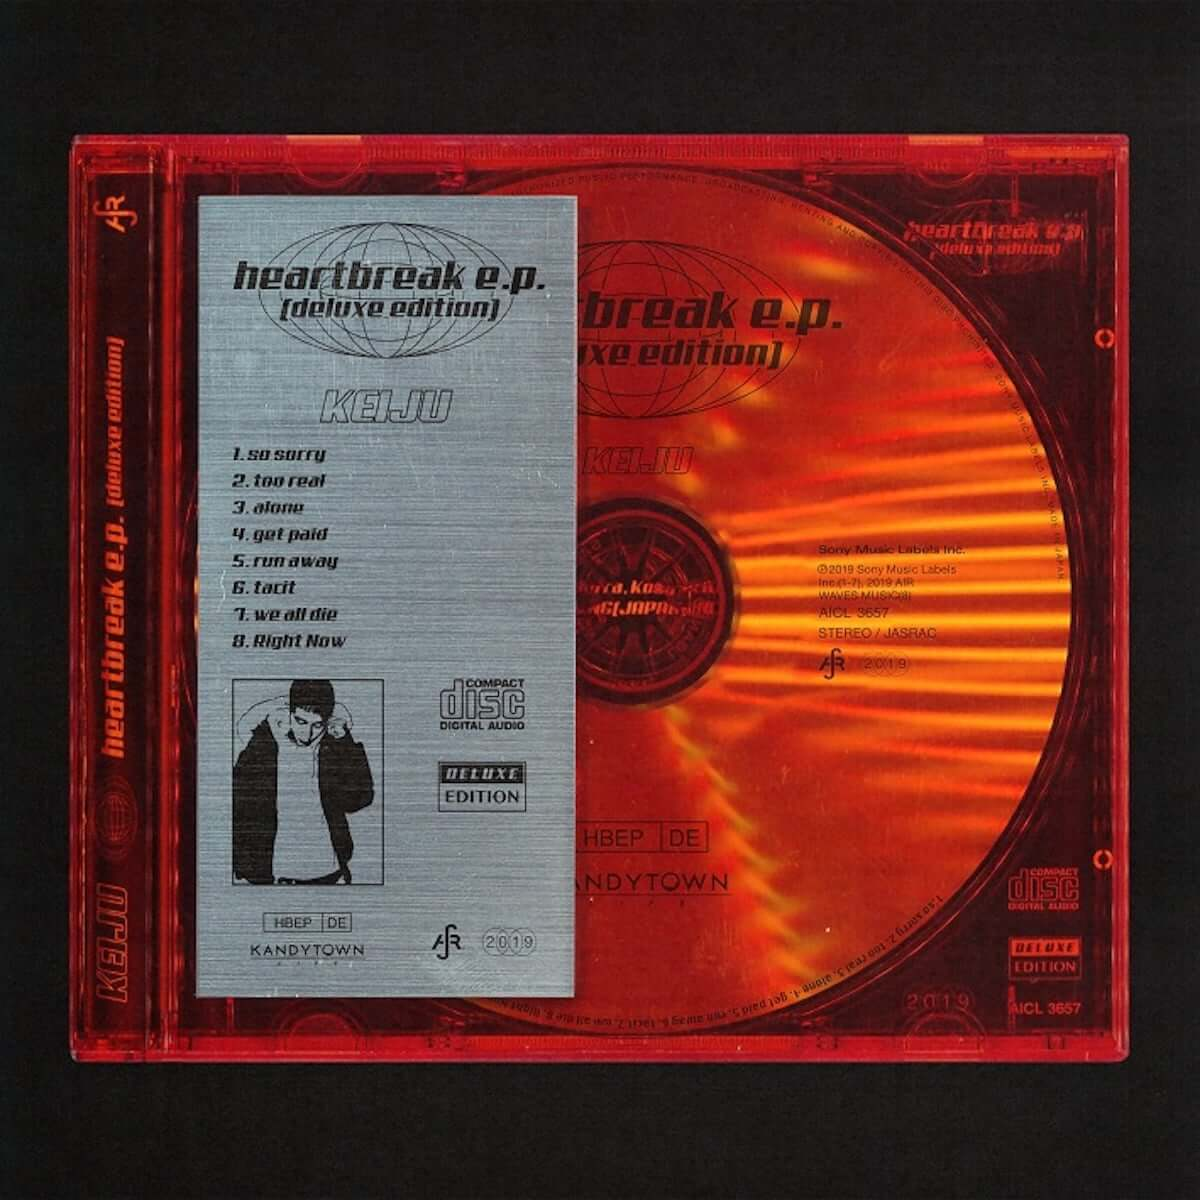 KEIJU、『heartbreak e.p.』に新曲を加えた完全生産限定盤を5月22日リリース|BAD HOPのYZERRらが新たに参加 music190422_keiju_2-1200x1200